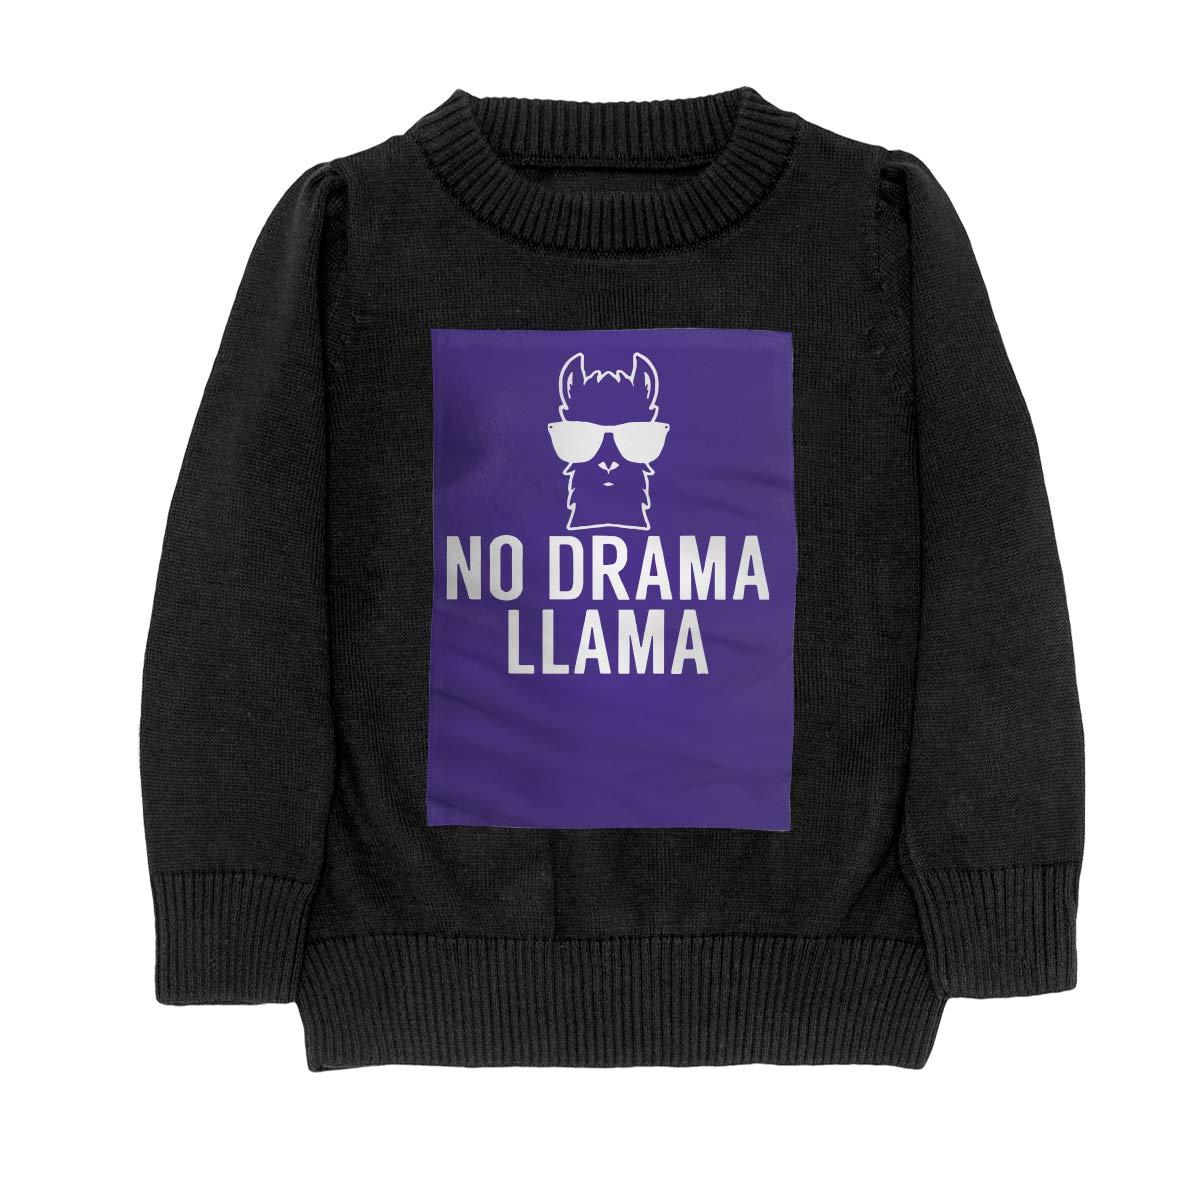 No Drama Llama Style Teenager Boys /& Girls Unisex Sweater Keep Warm